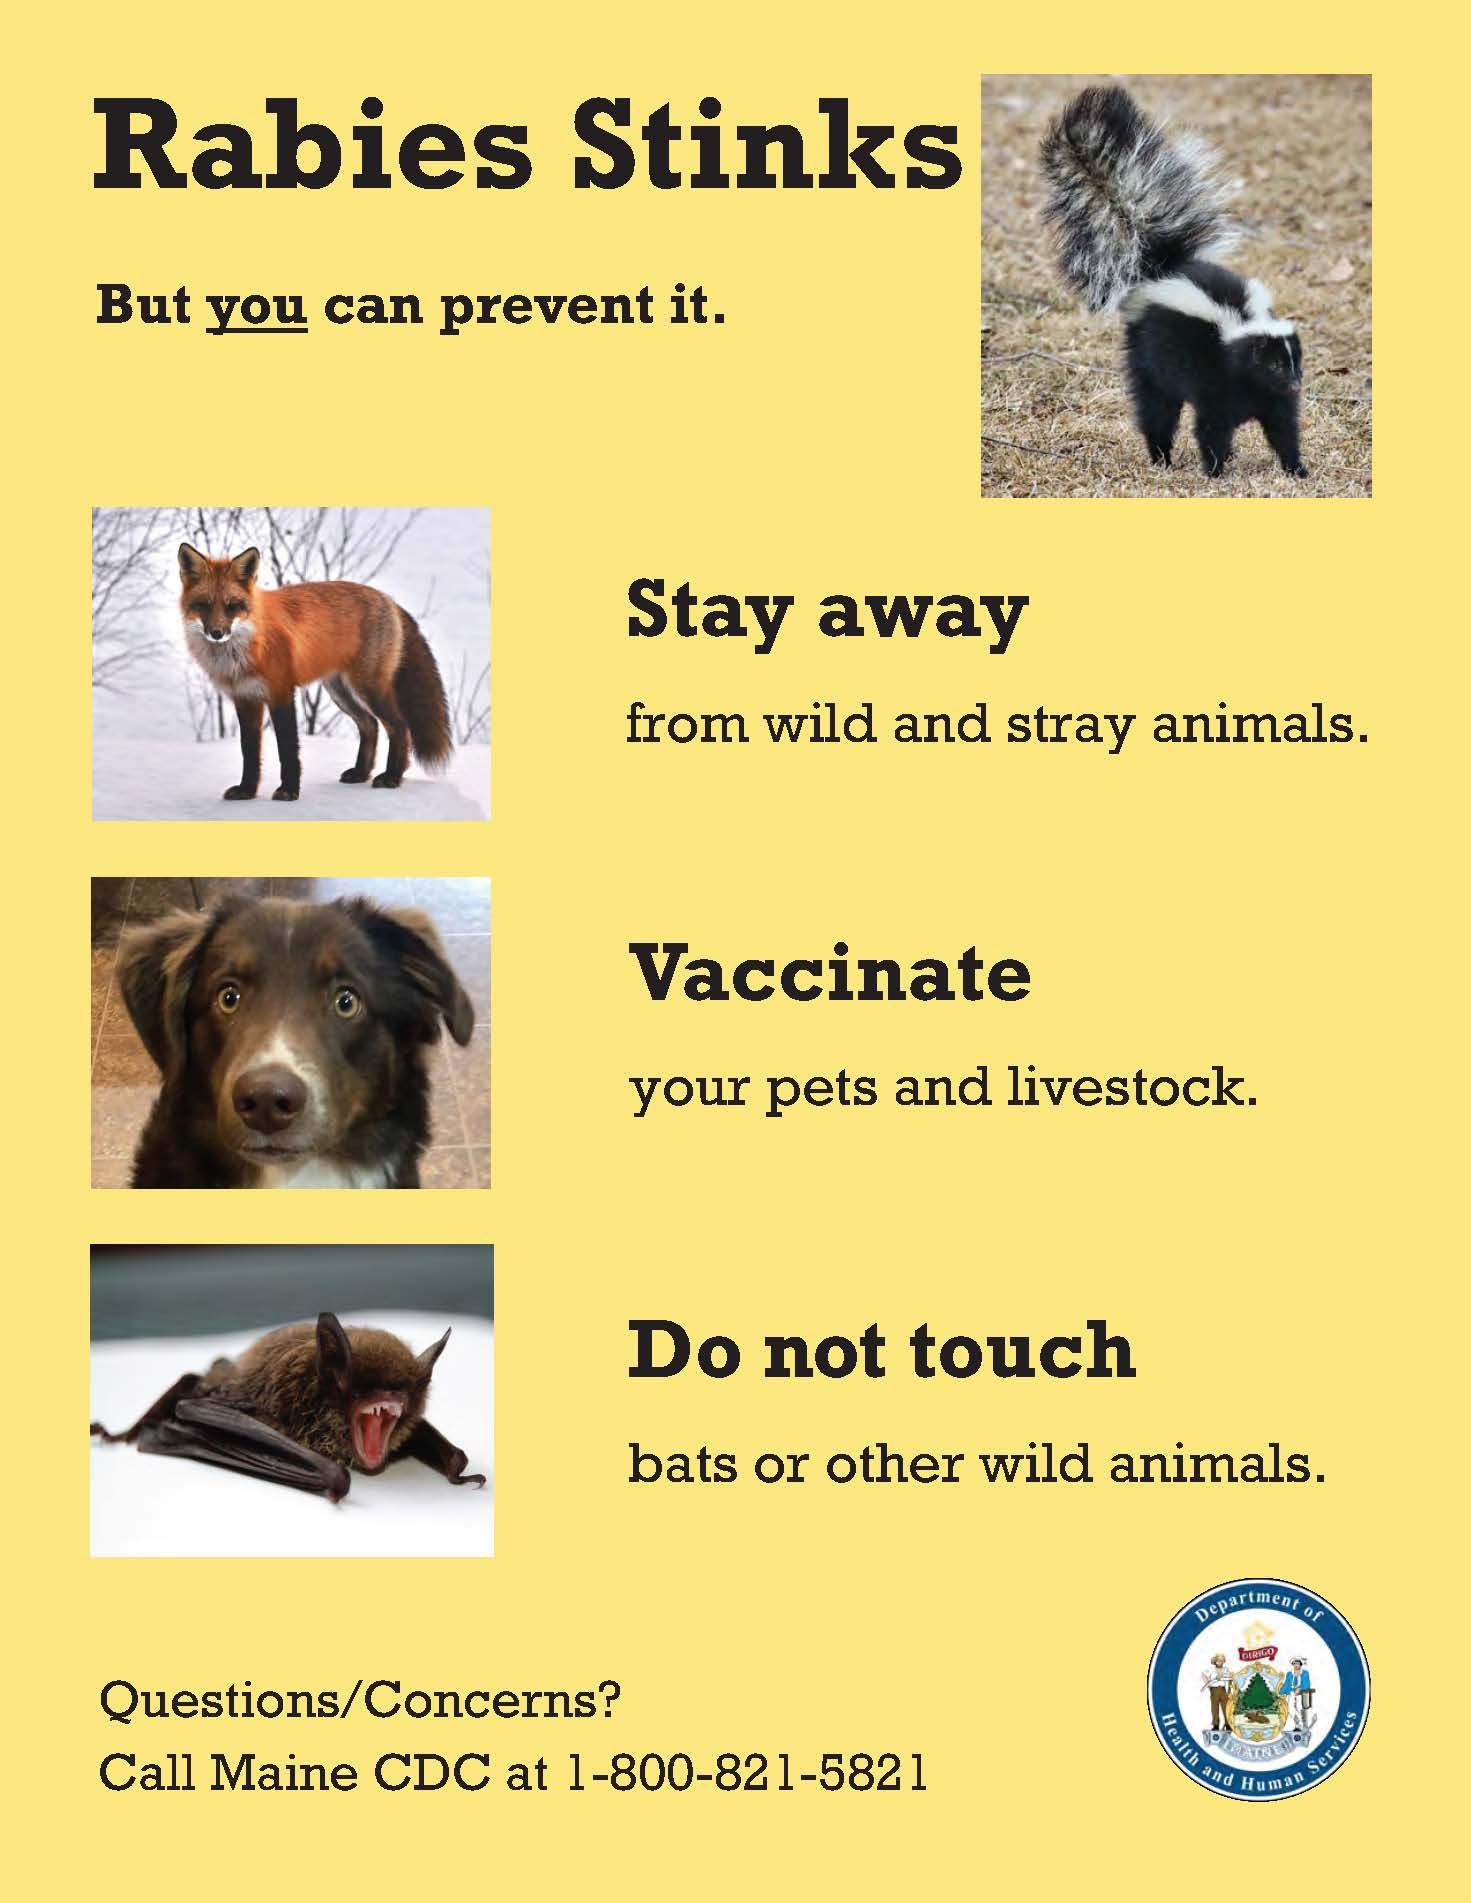 Rabies Stinks Poster